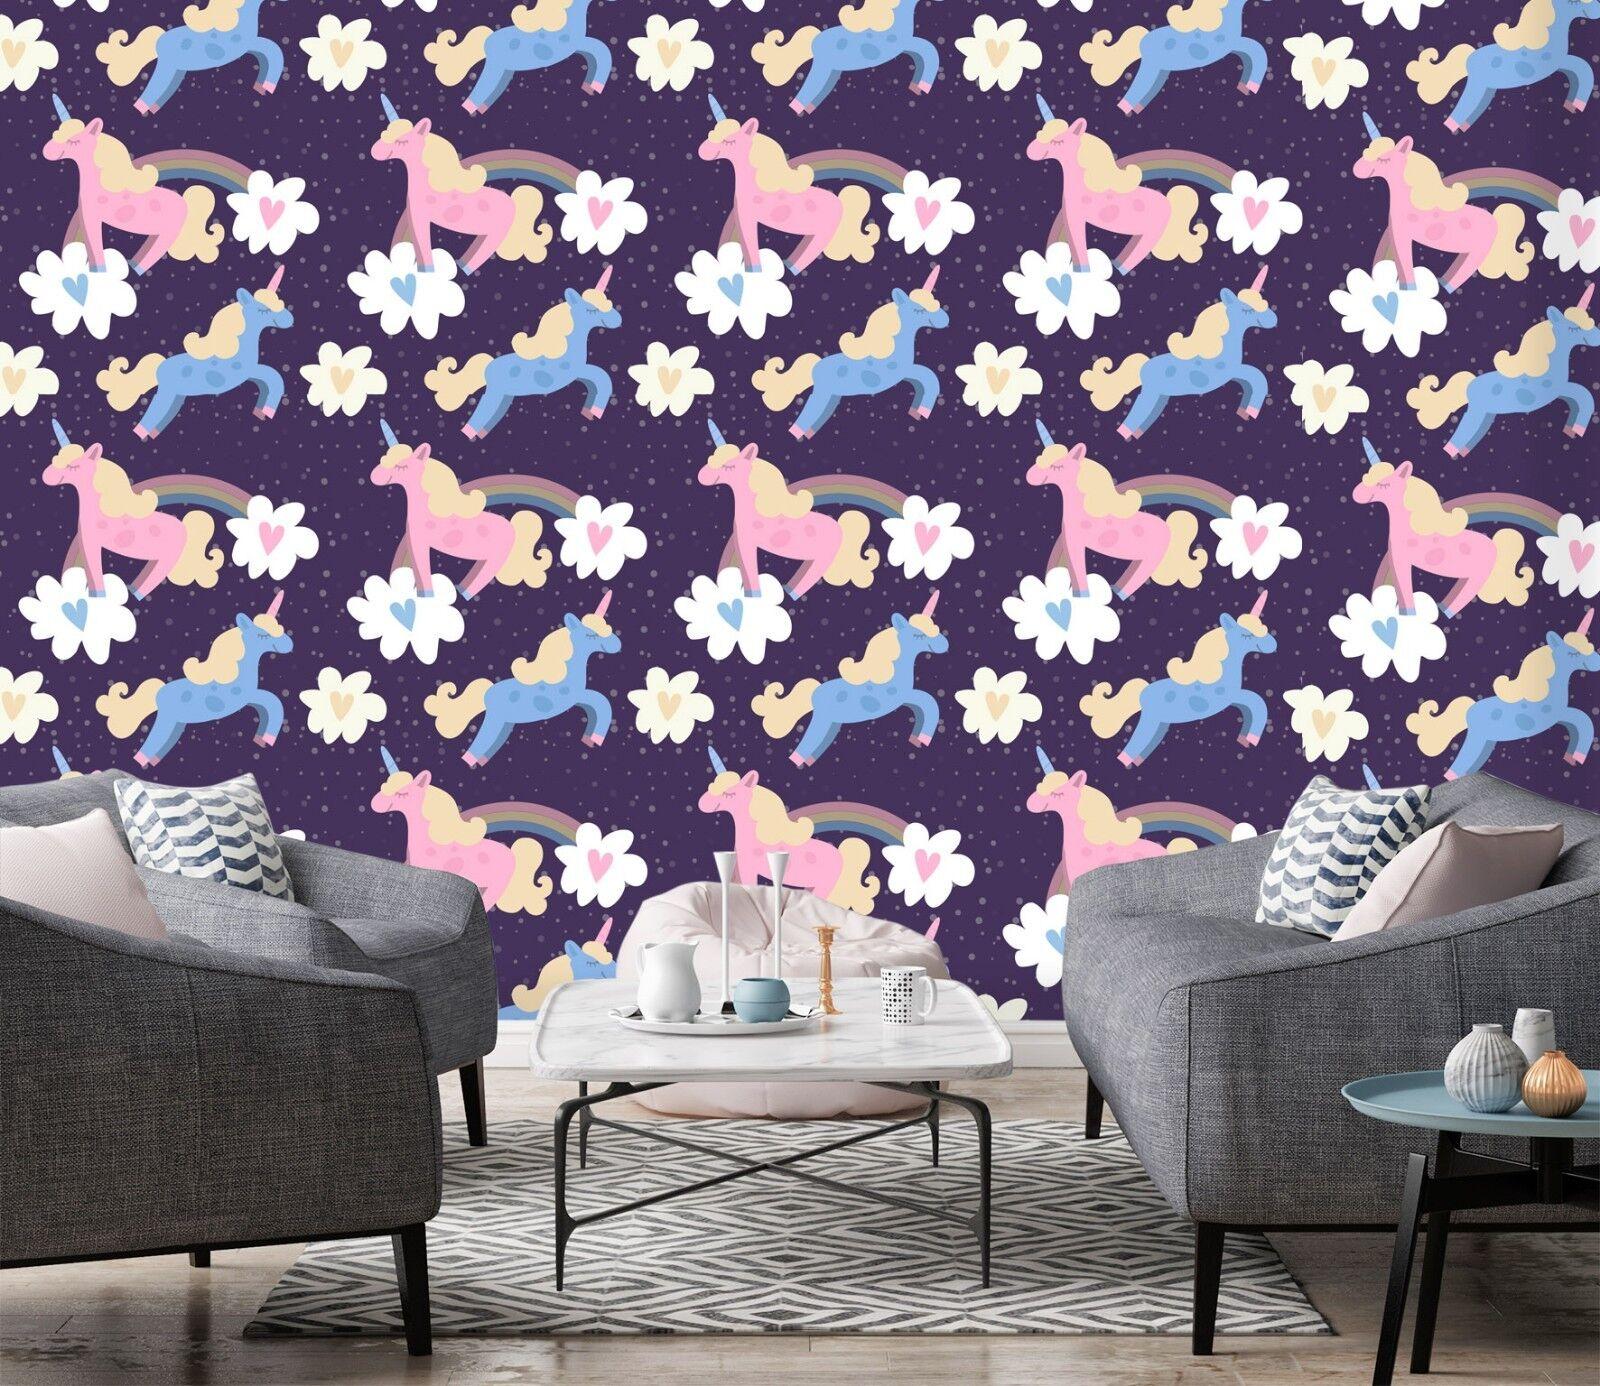 3D Rainbow Unicorn Cloud 21 Wallpaper Mural Wall Print Decal Indoor Murals AU